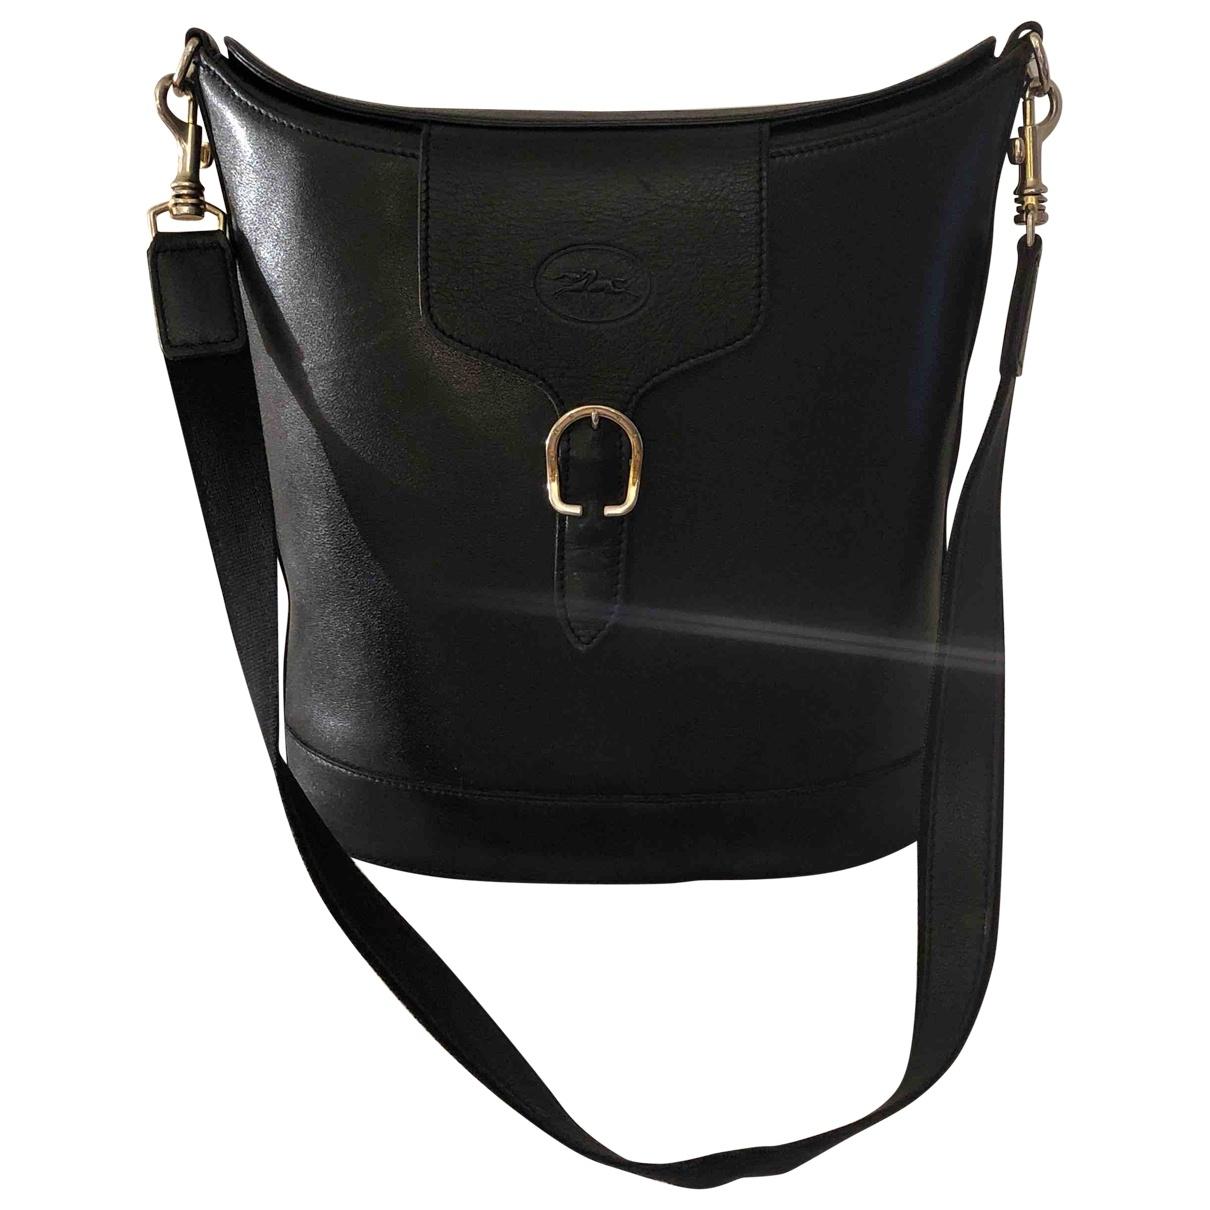 Longchamp - Sac a main Balzane pour femme en cuir - noir